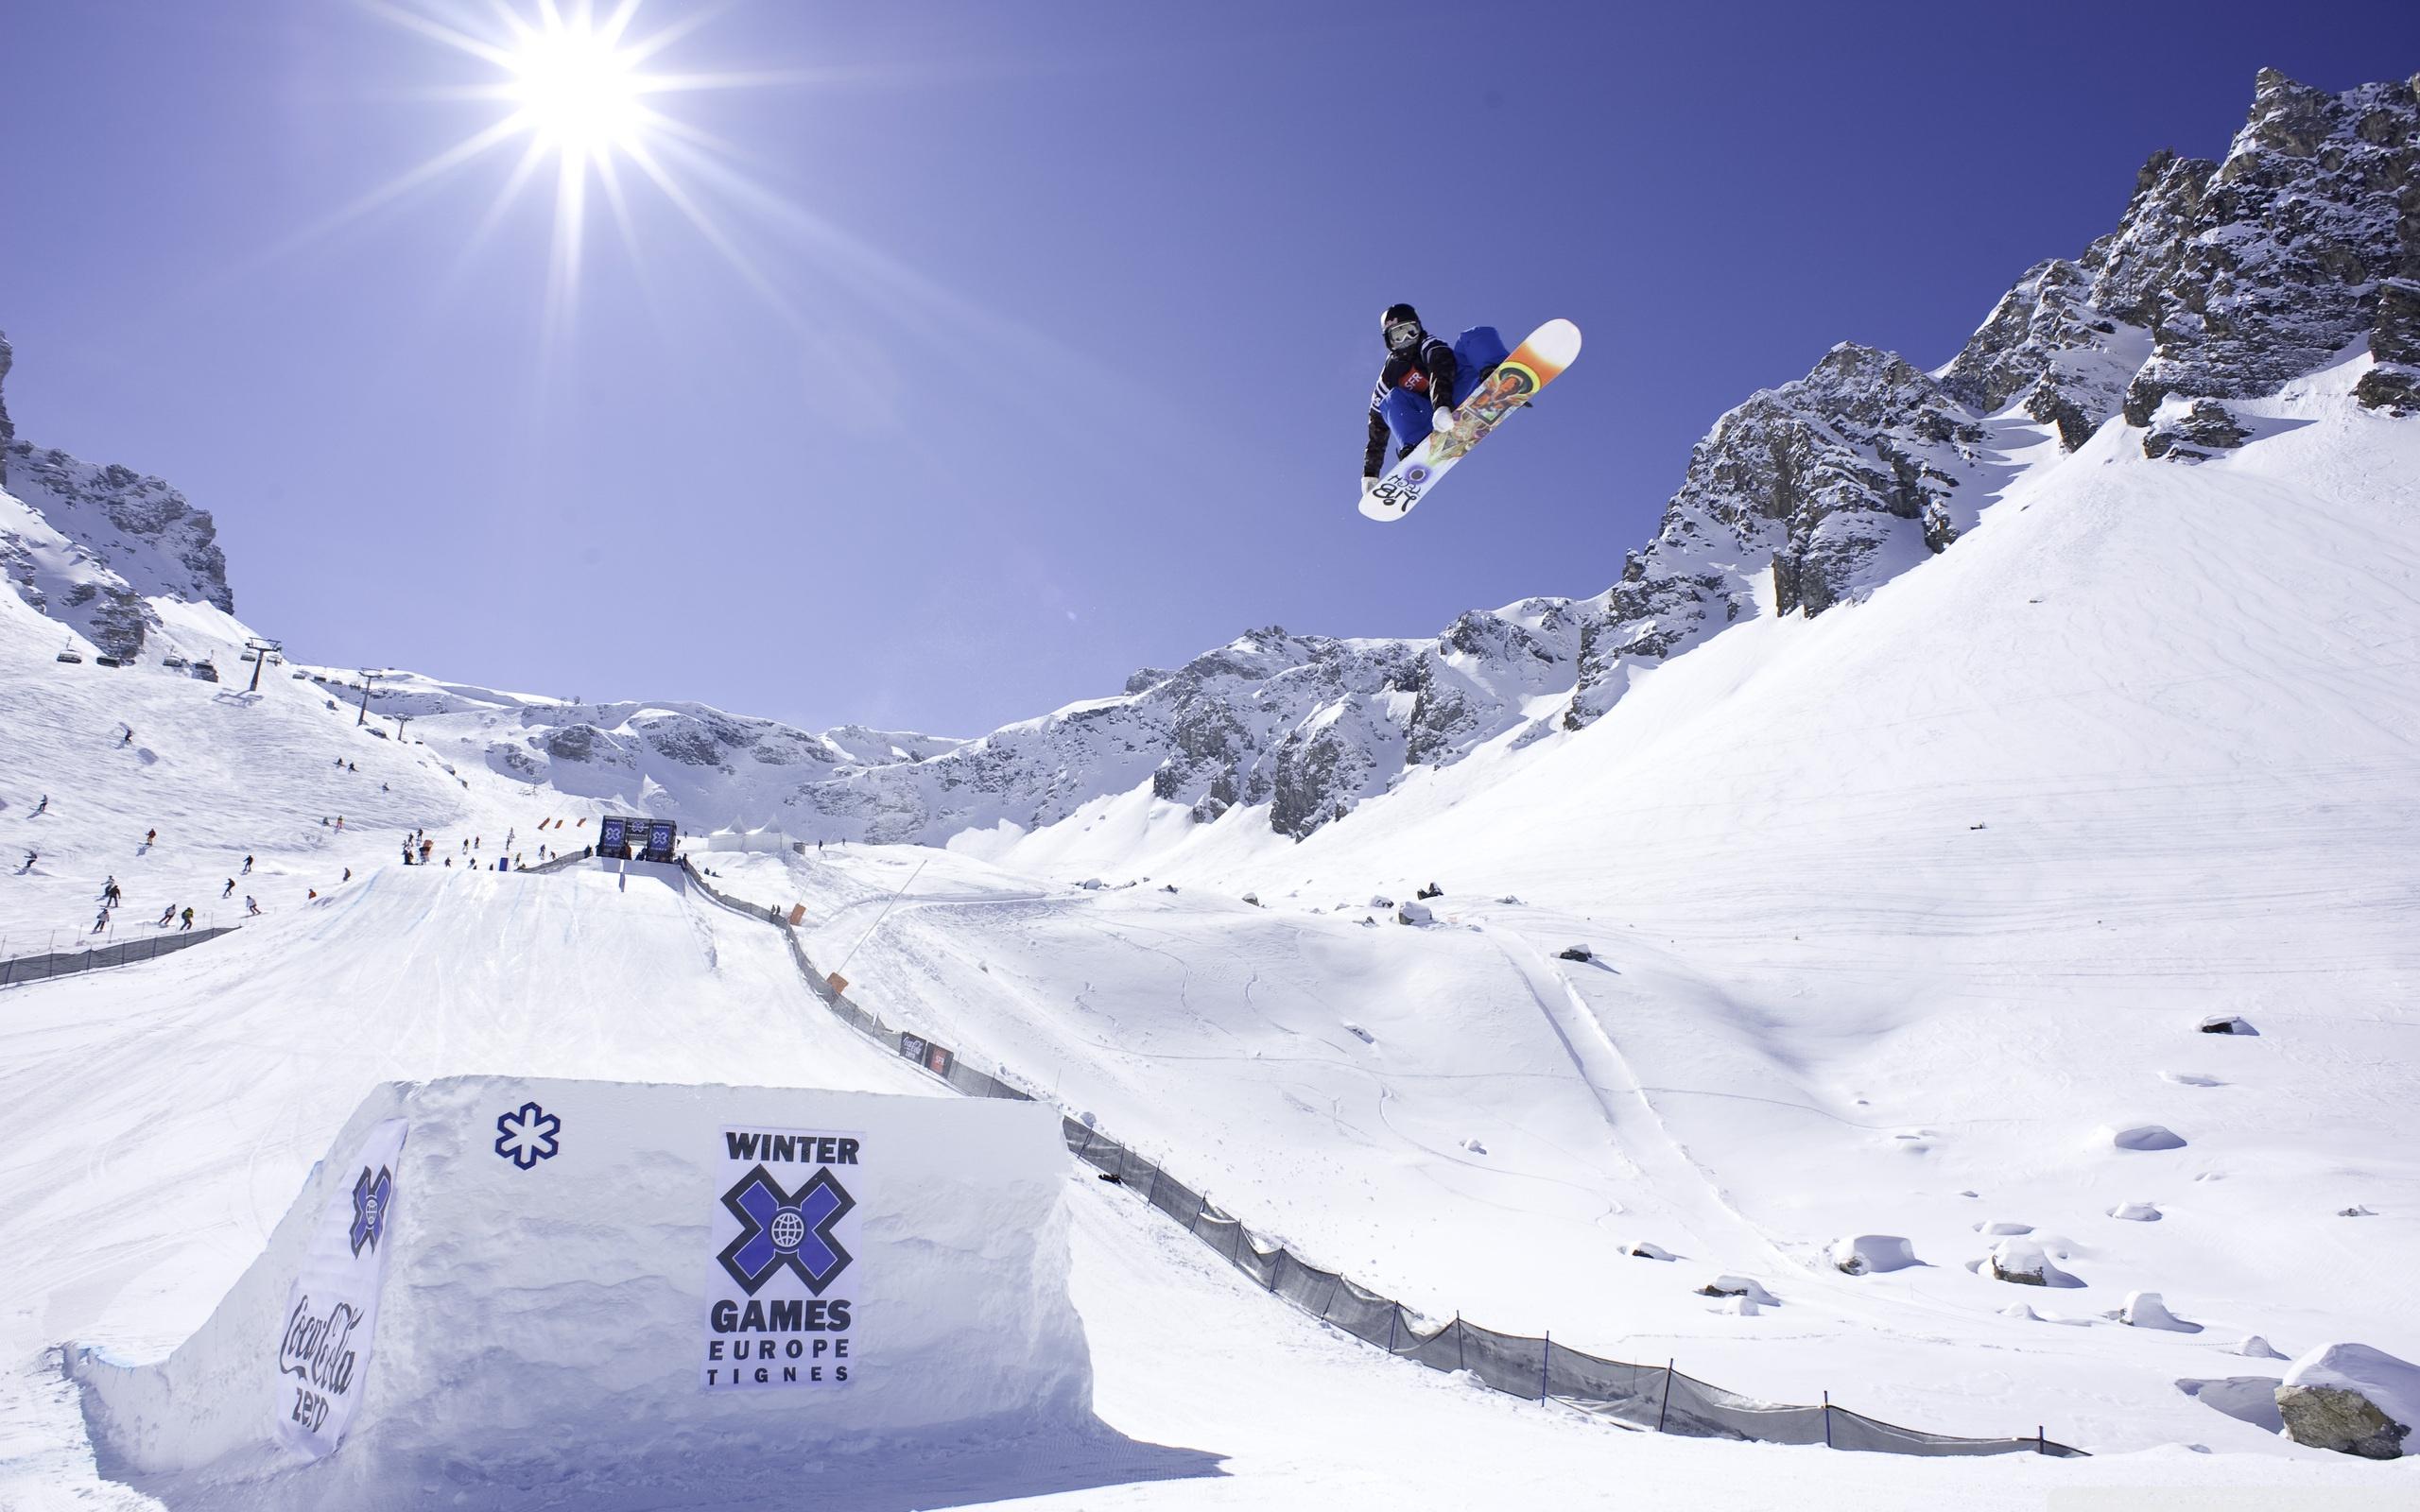 Winter Games Europe Tignes 4K HD Desktop Wallpaper for 4K Ultra 2560x1600